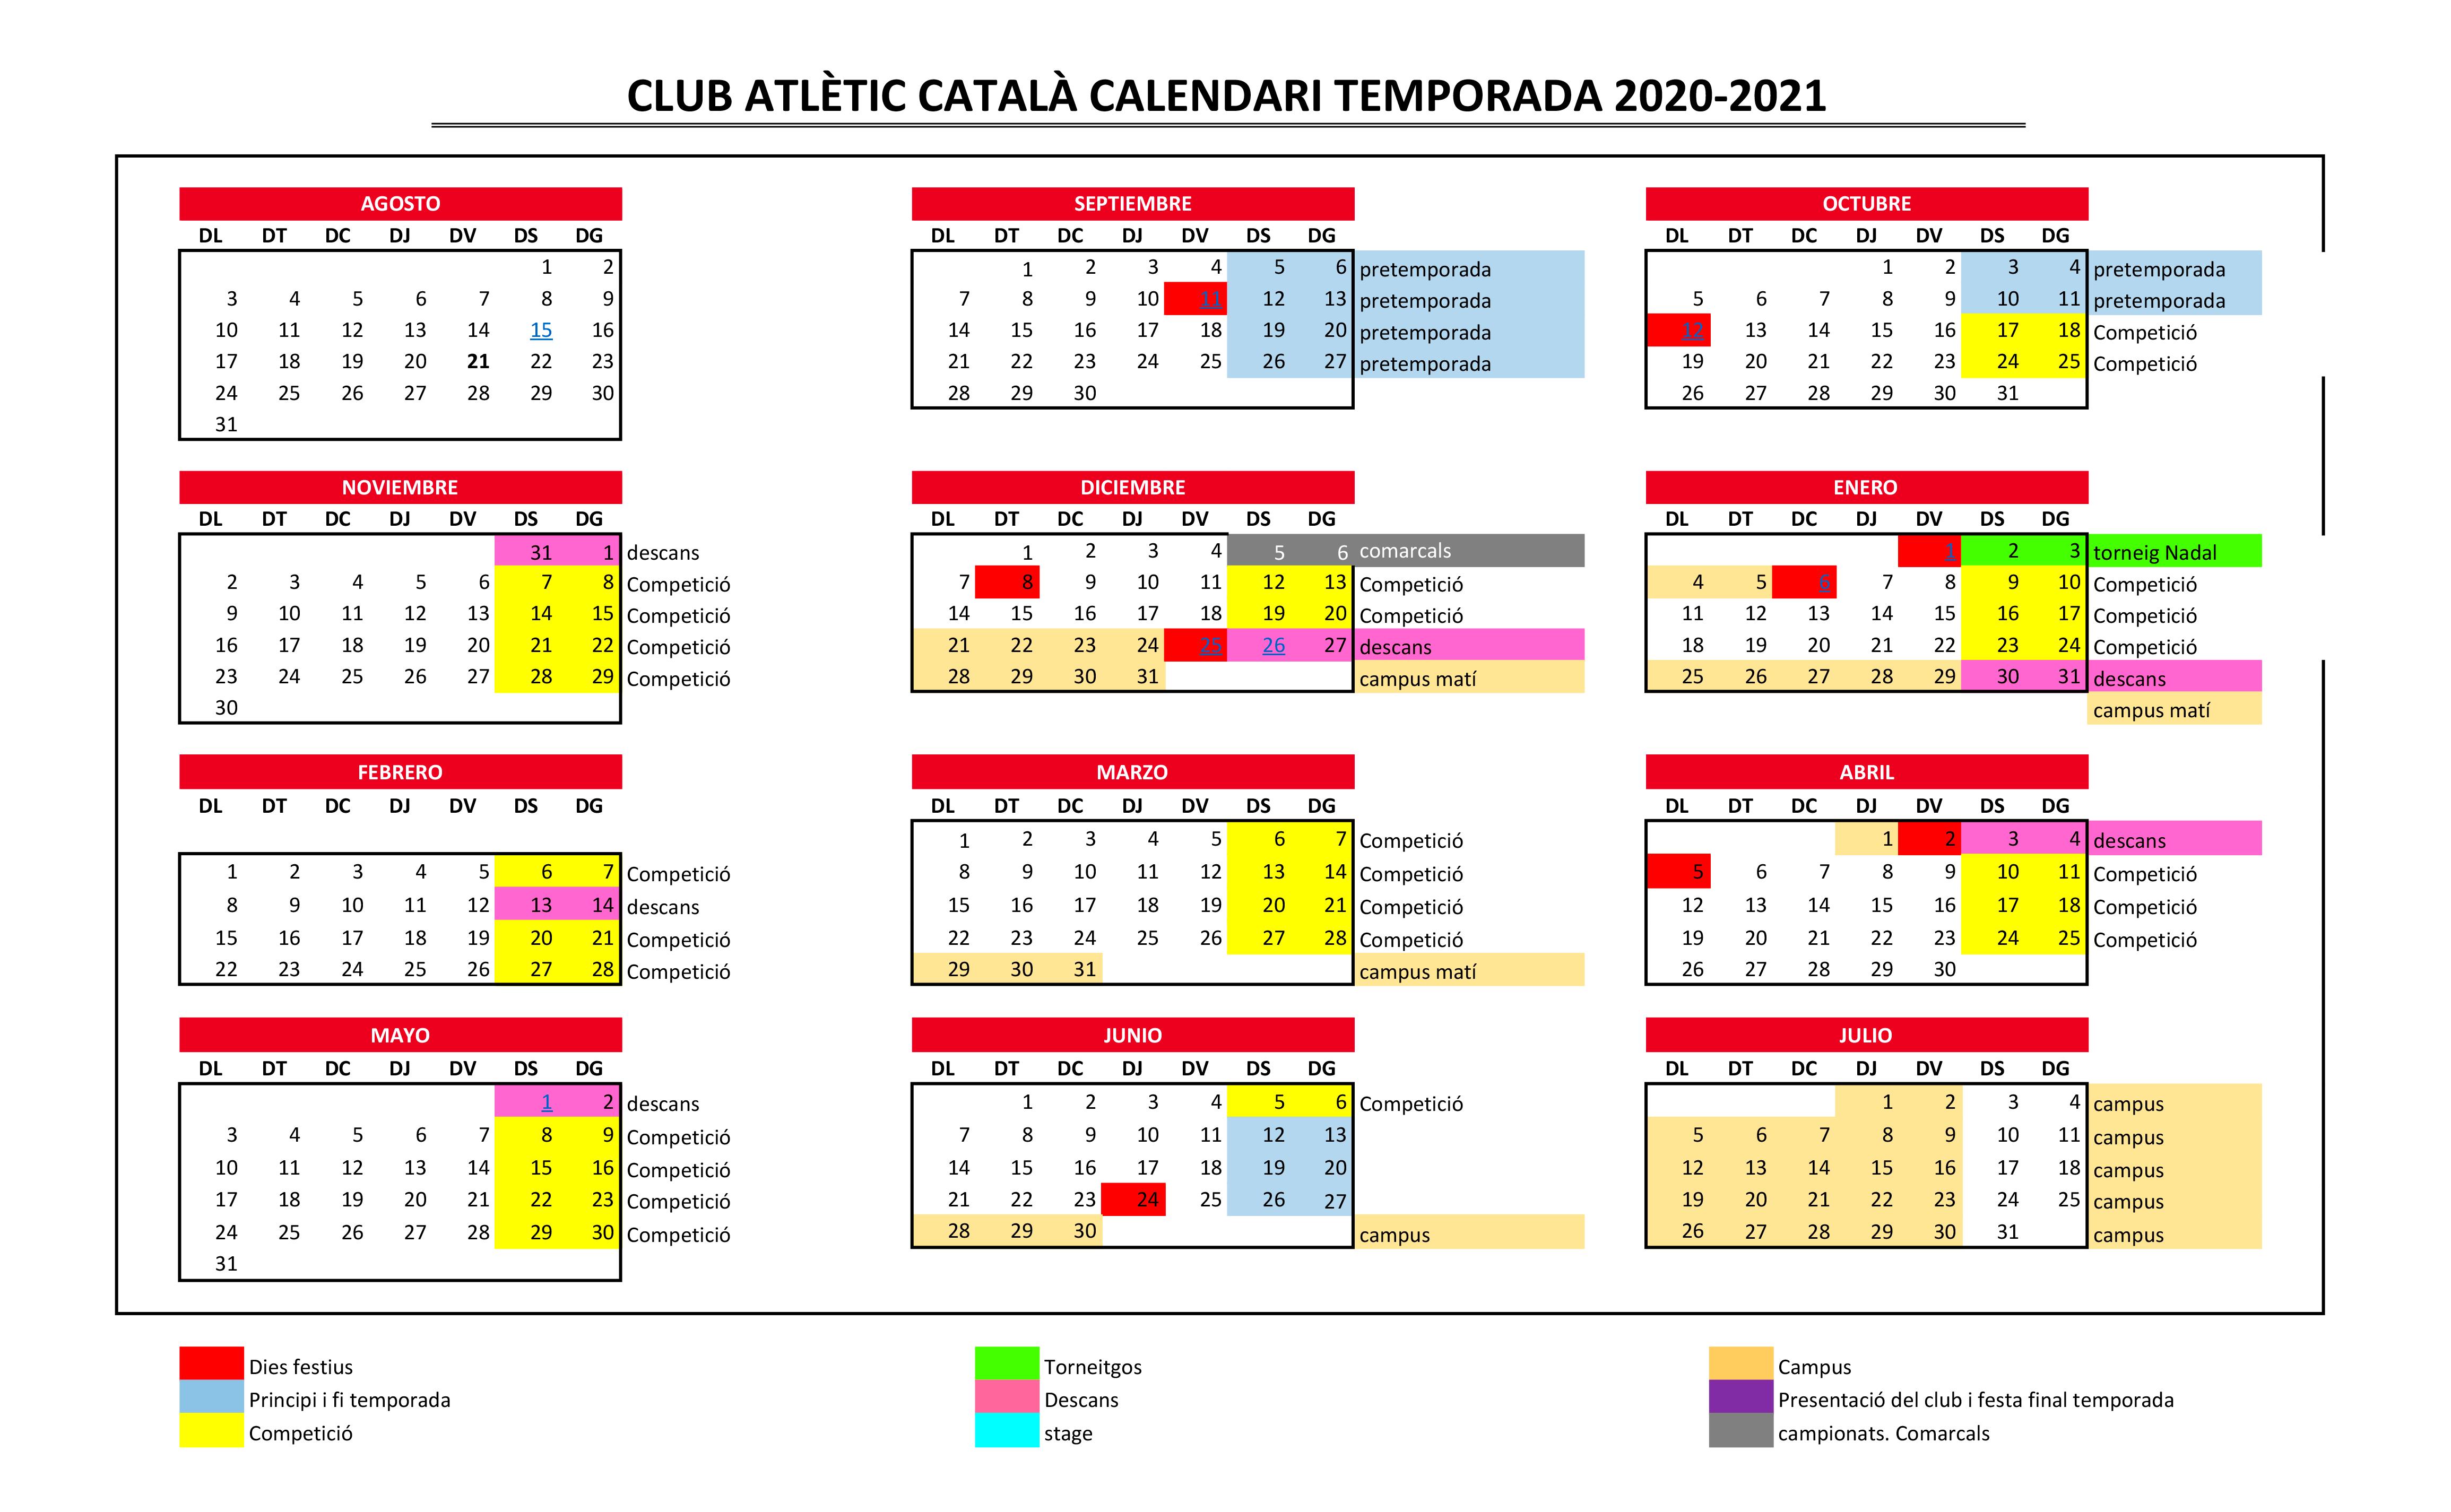 CALENDARI TEMPORADA 2020-21 - Hoja1-1